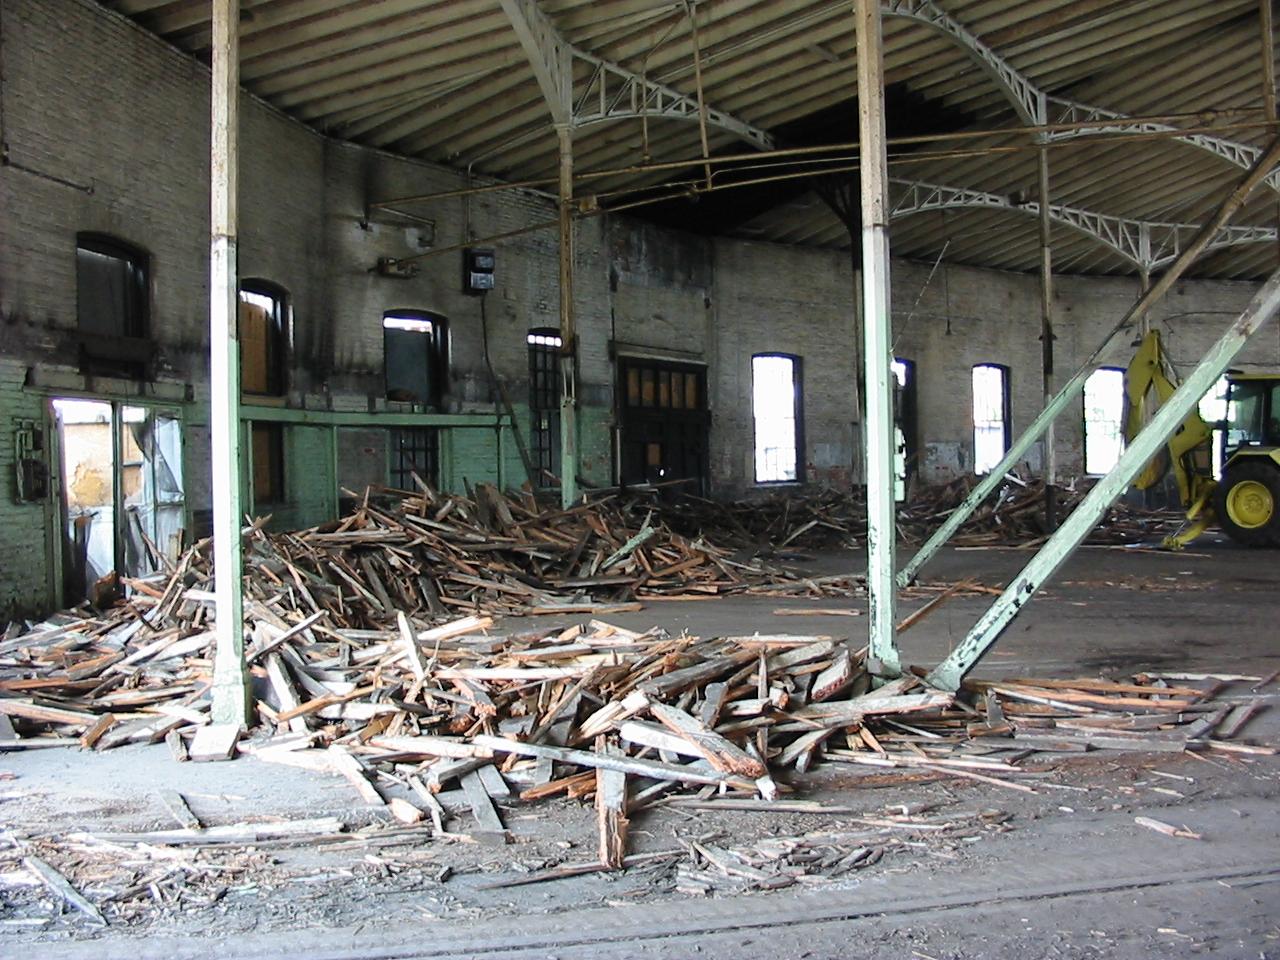 Roundhouse before restoration began